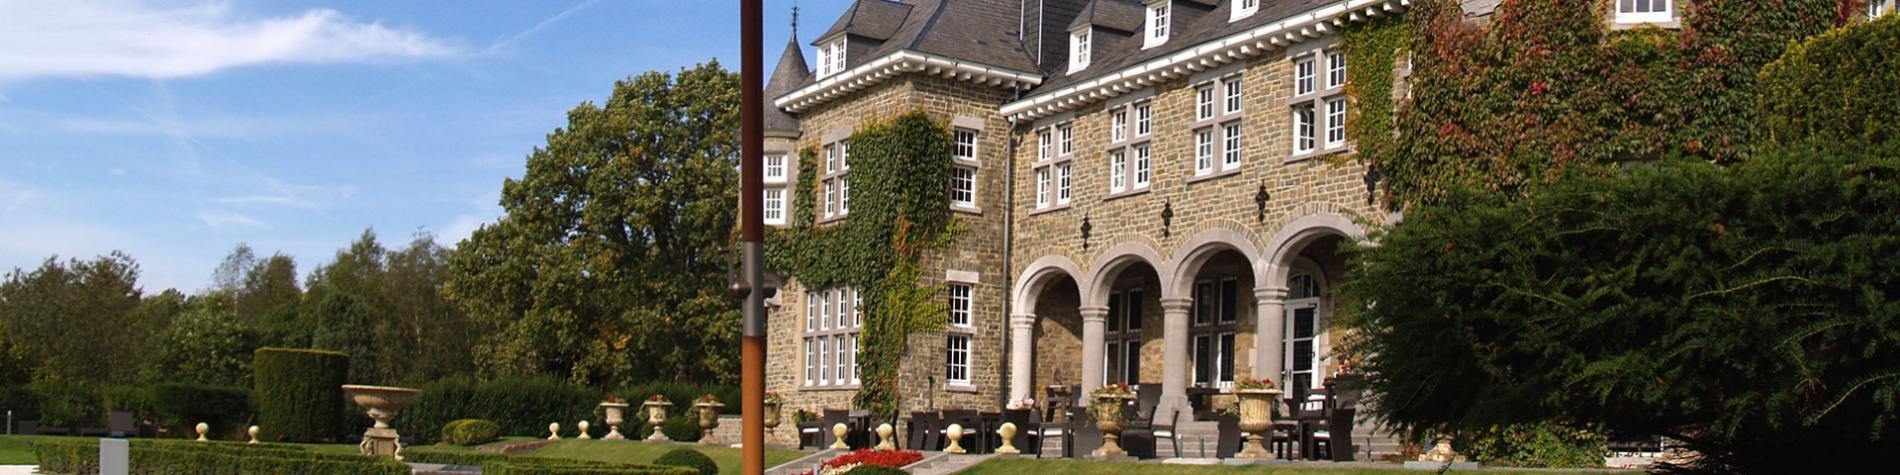 Manoir - Lébioles - Spa - Hôtel - wellness - restaurant - Ardenne